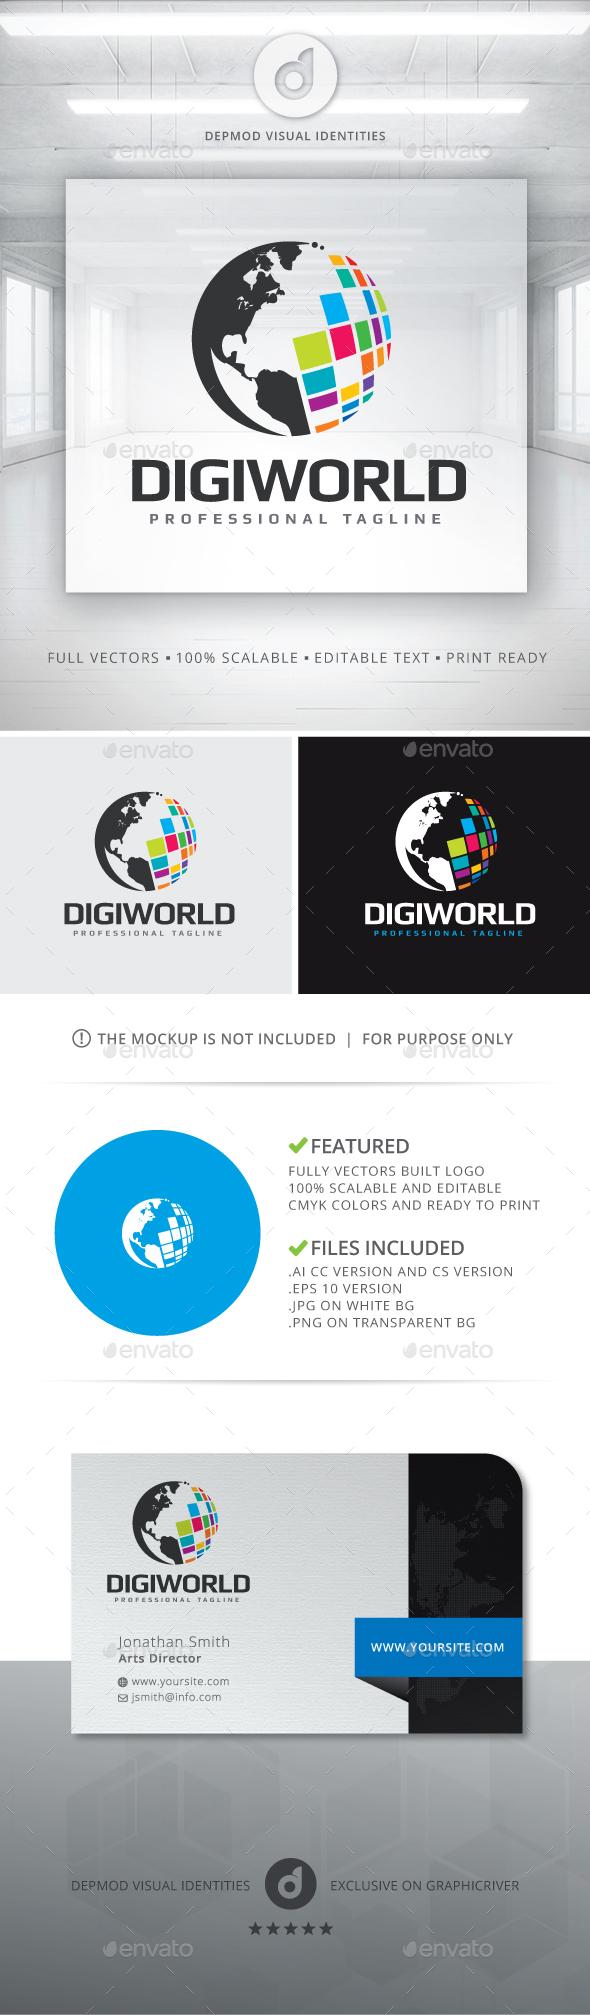 DigiWorld Logo